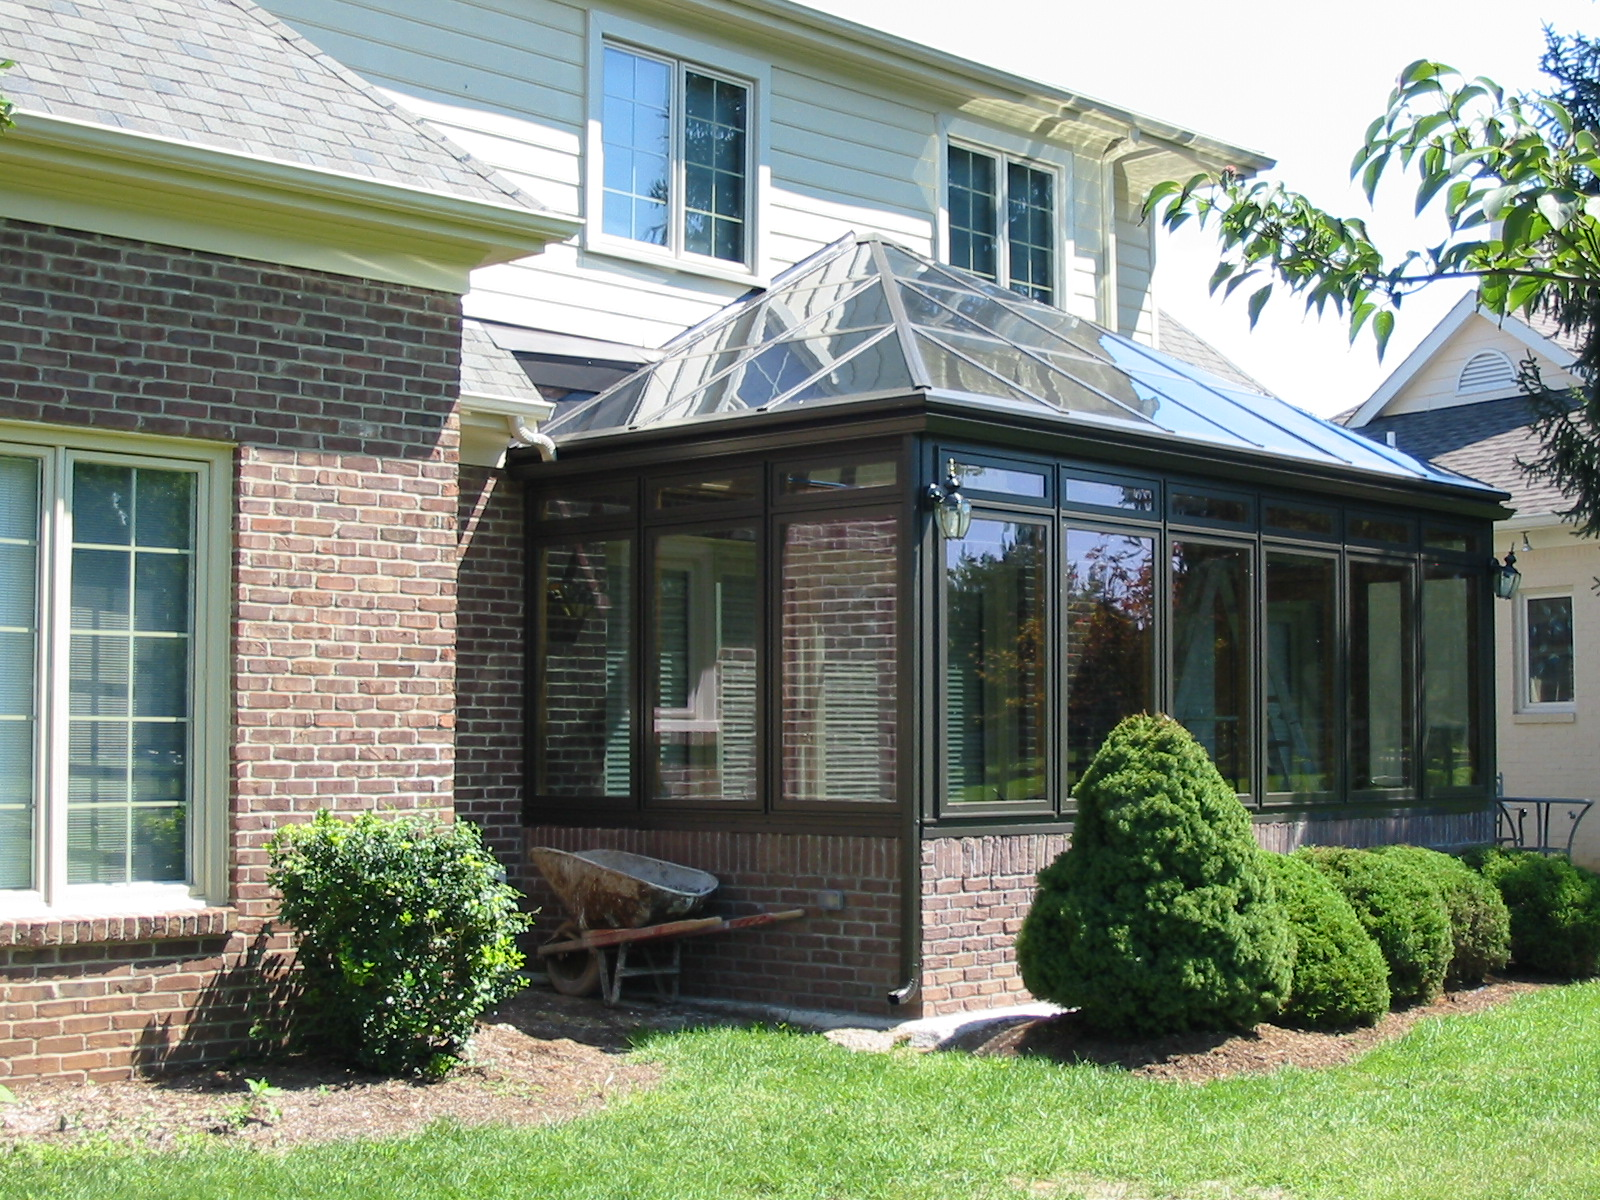 Georgian Conservatory Aluminum Glass Roof Design Bronze on brick basewall